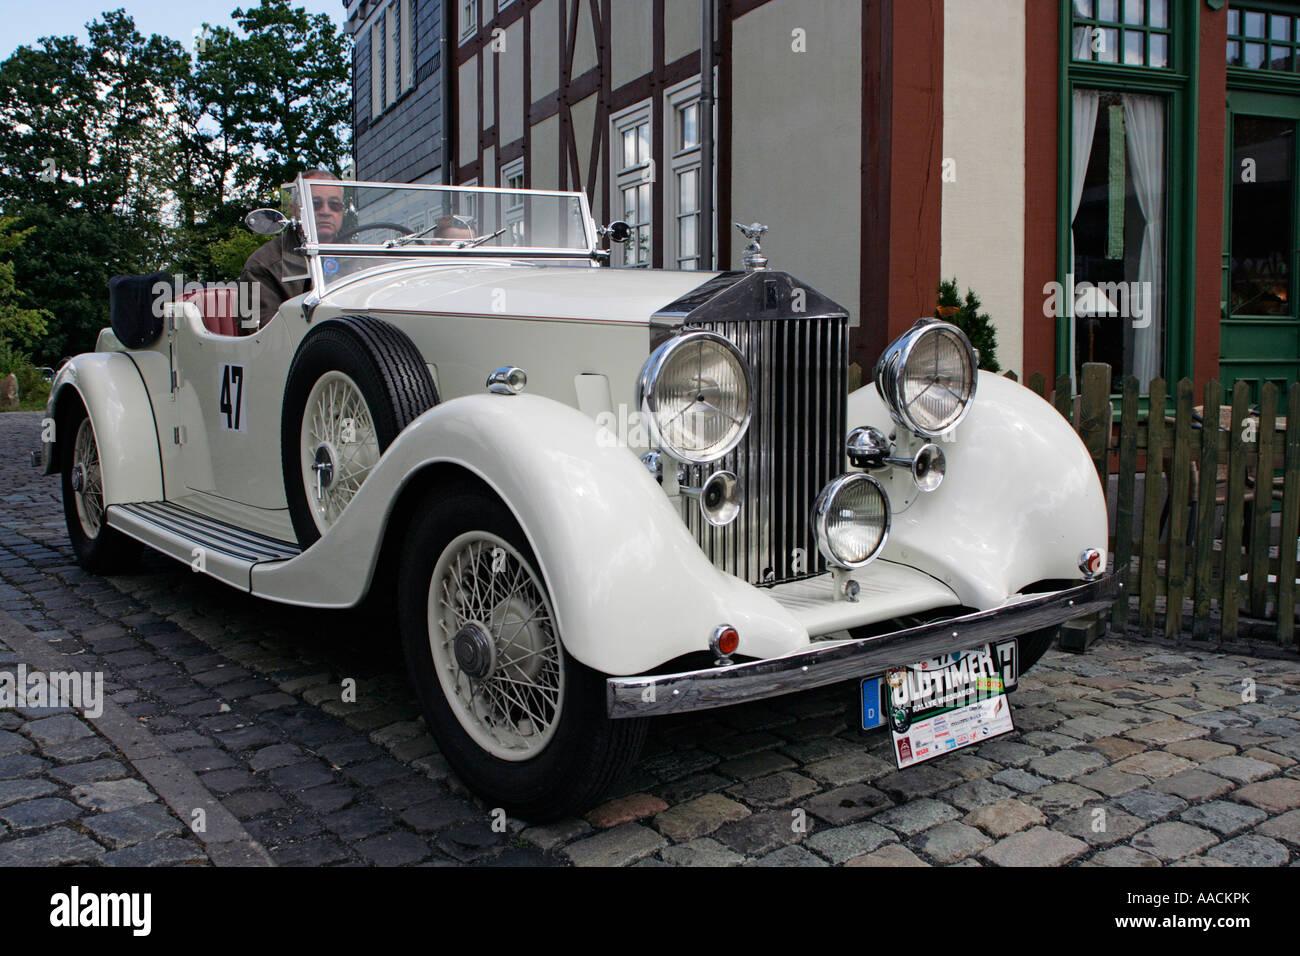 Damn!! Looks 1938 vintage hot. Love